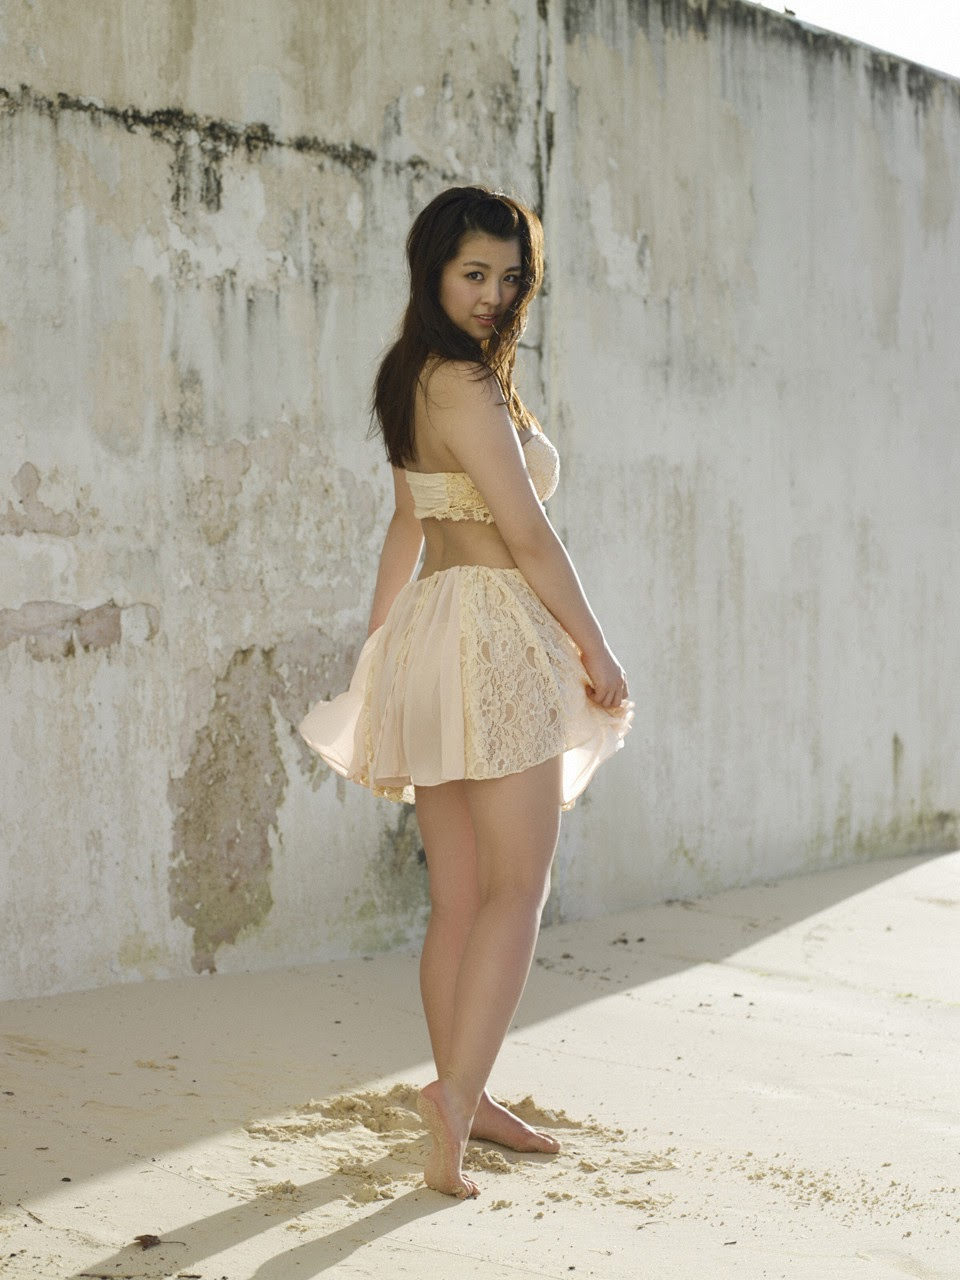 Bikini on a white sandy beach058